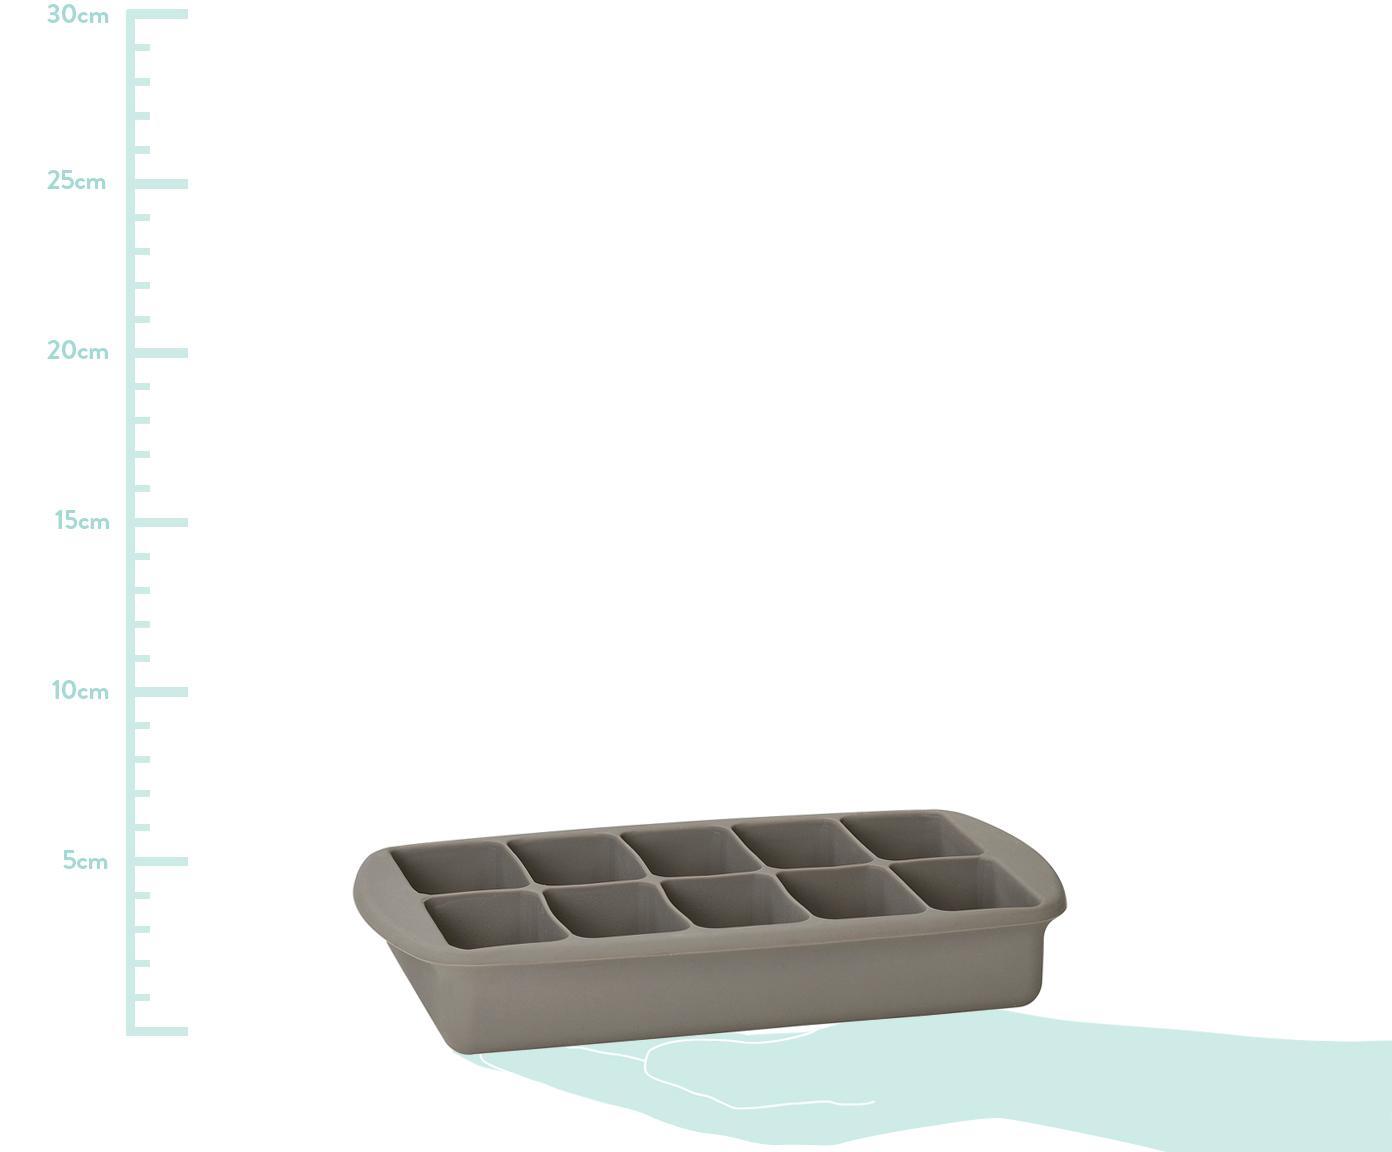 Eiswürfelform Glins, Deckel: Kunststoff, Grau, 21 x 4 cm